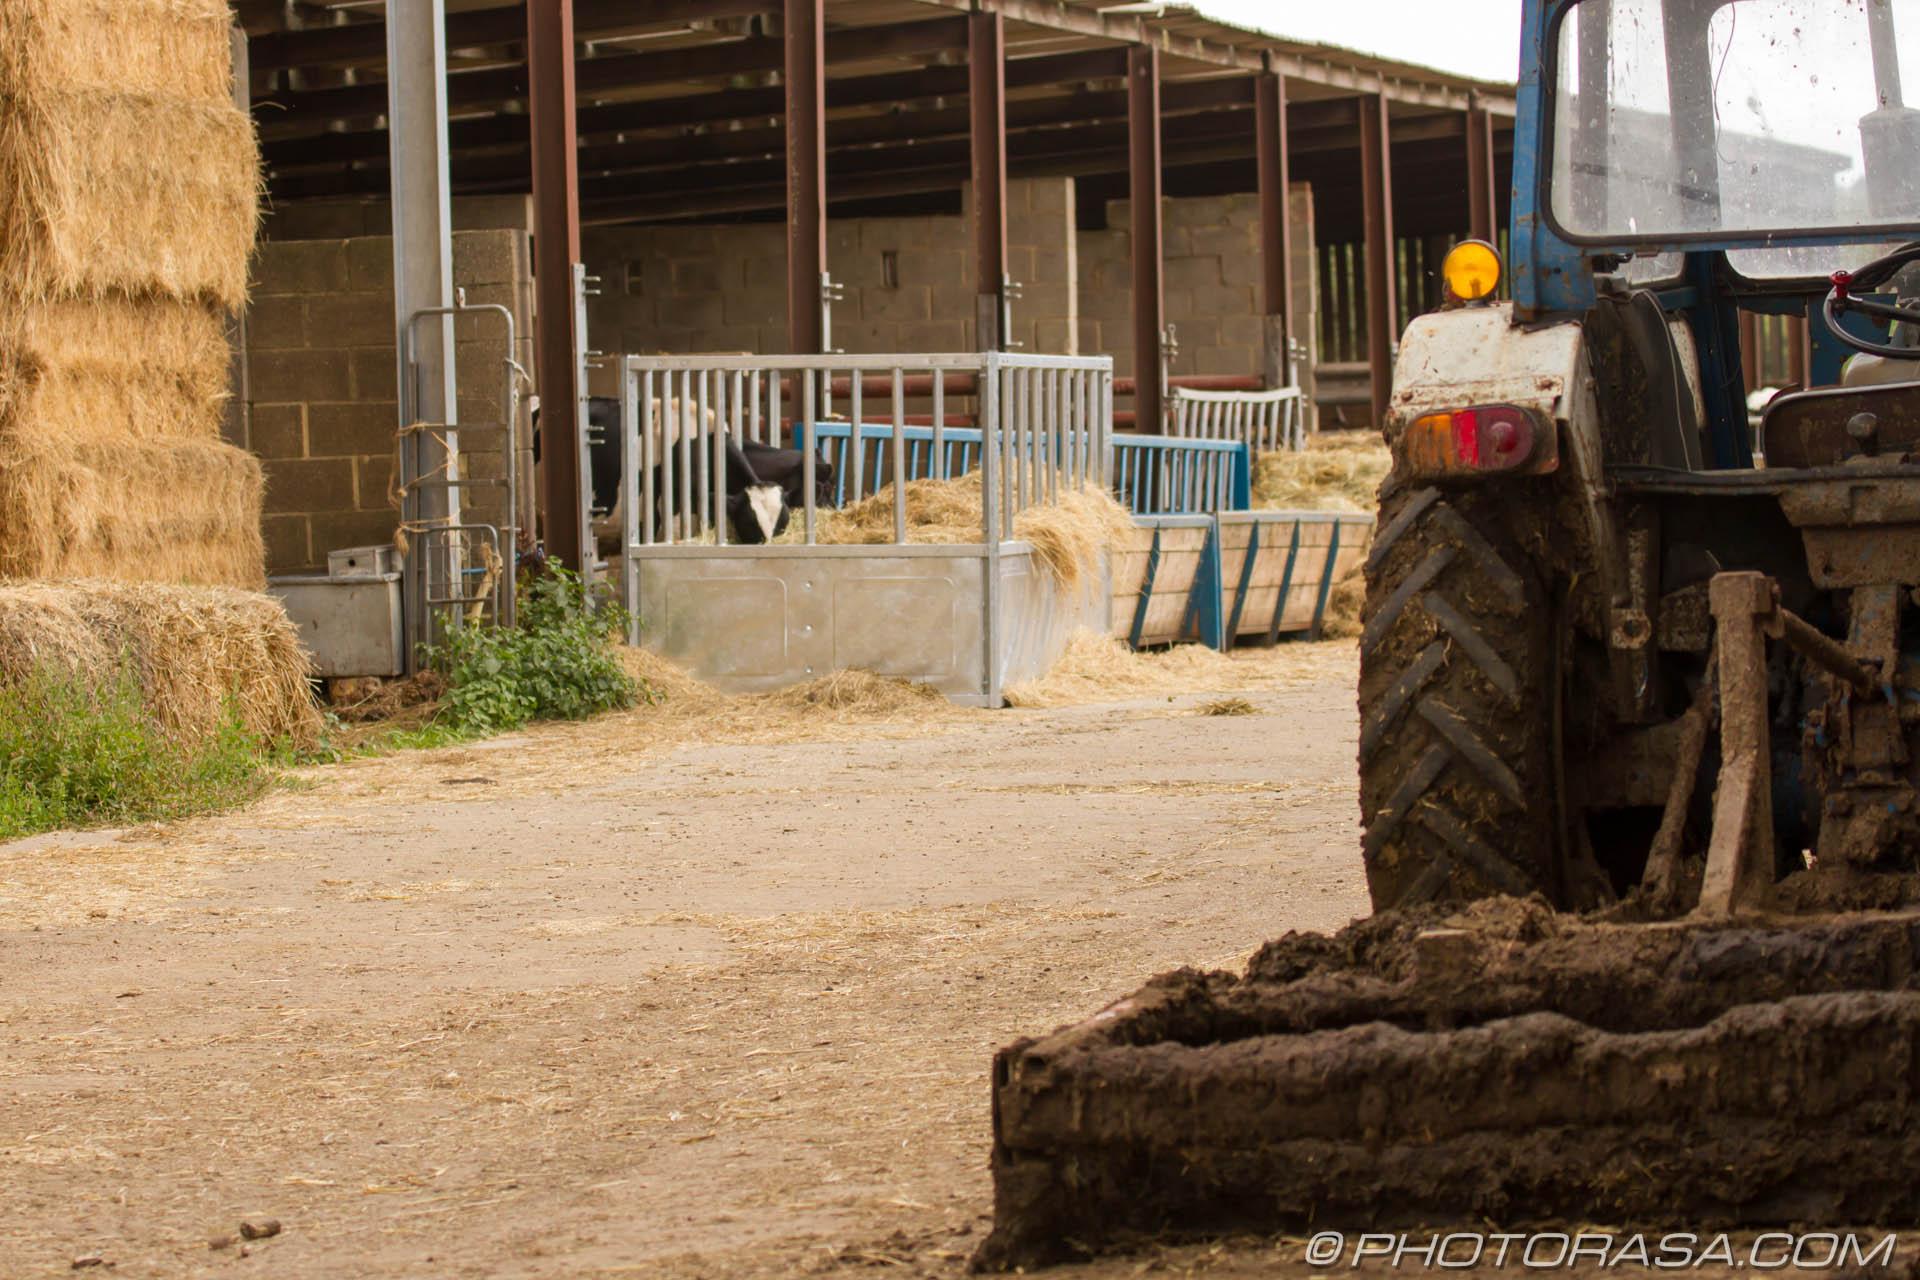 https://photorasa.com/farming/muddy-tractor-on-farm/